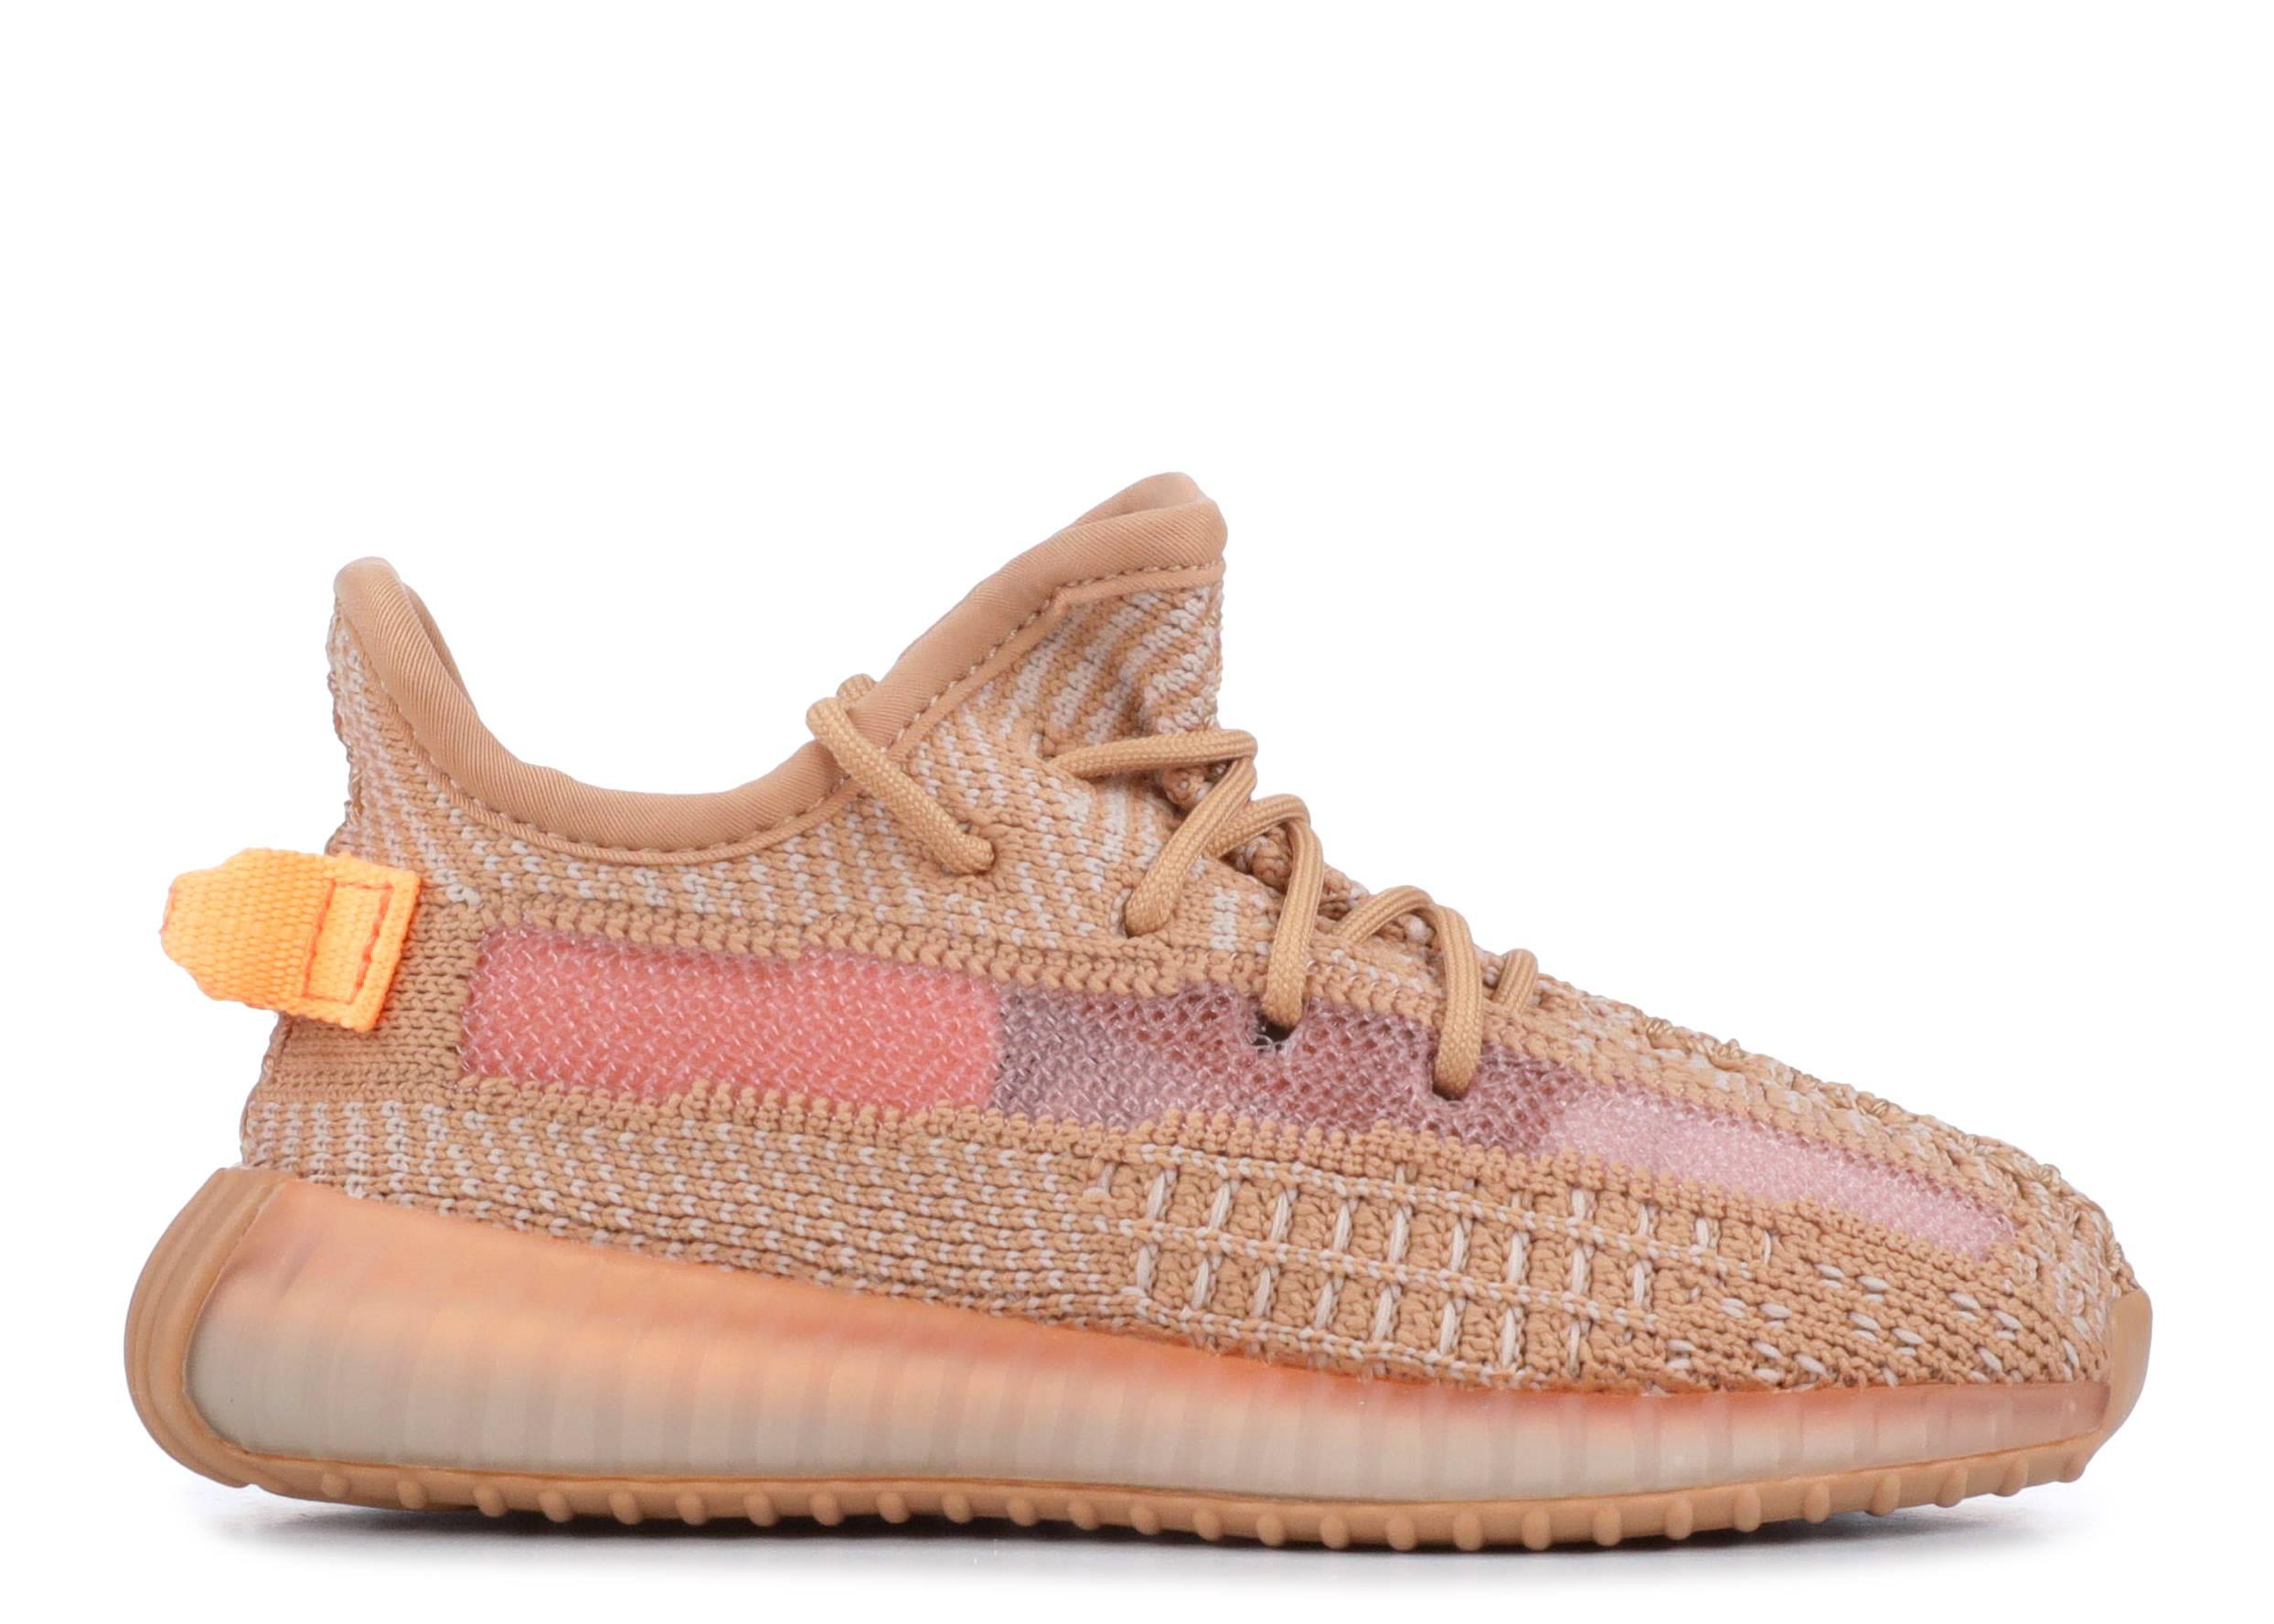 adidas yeezy boost 350 baby